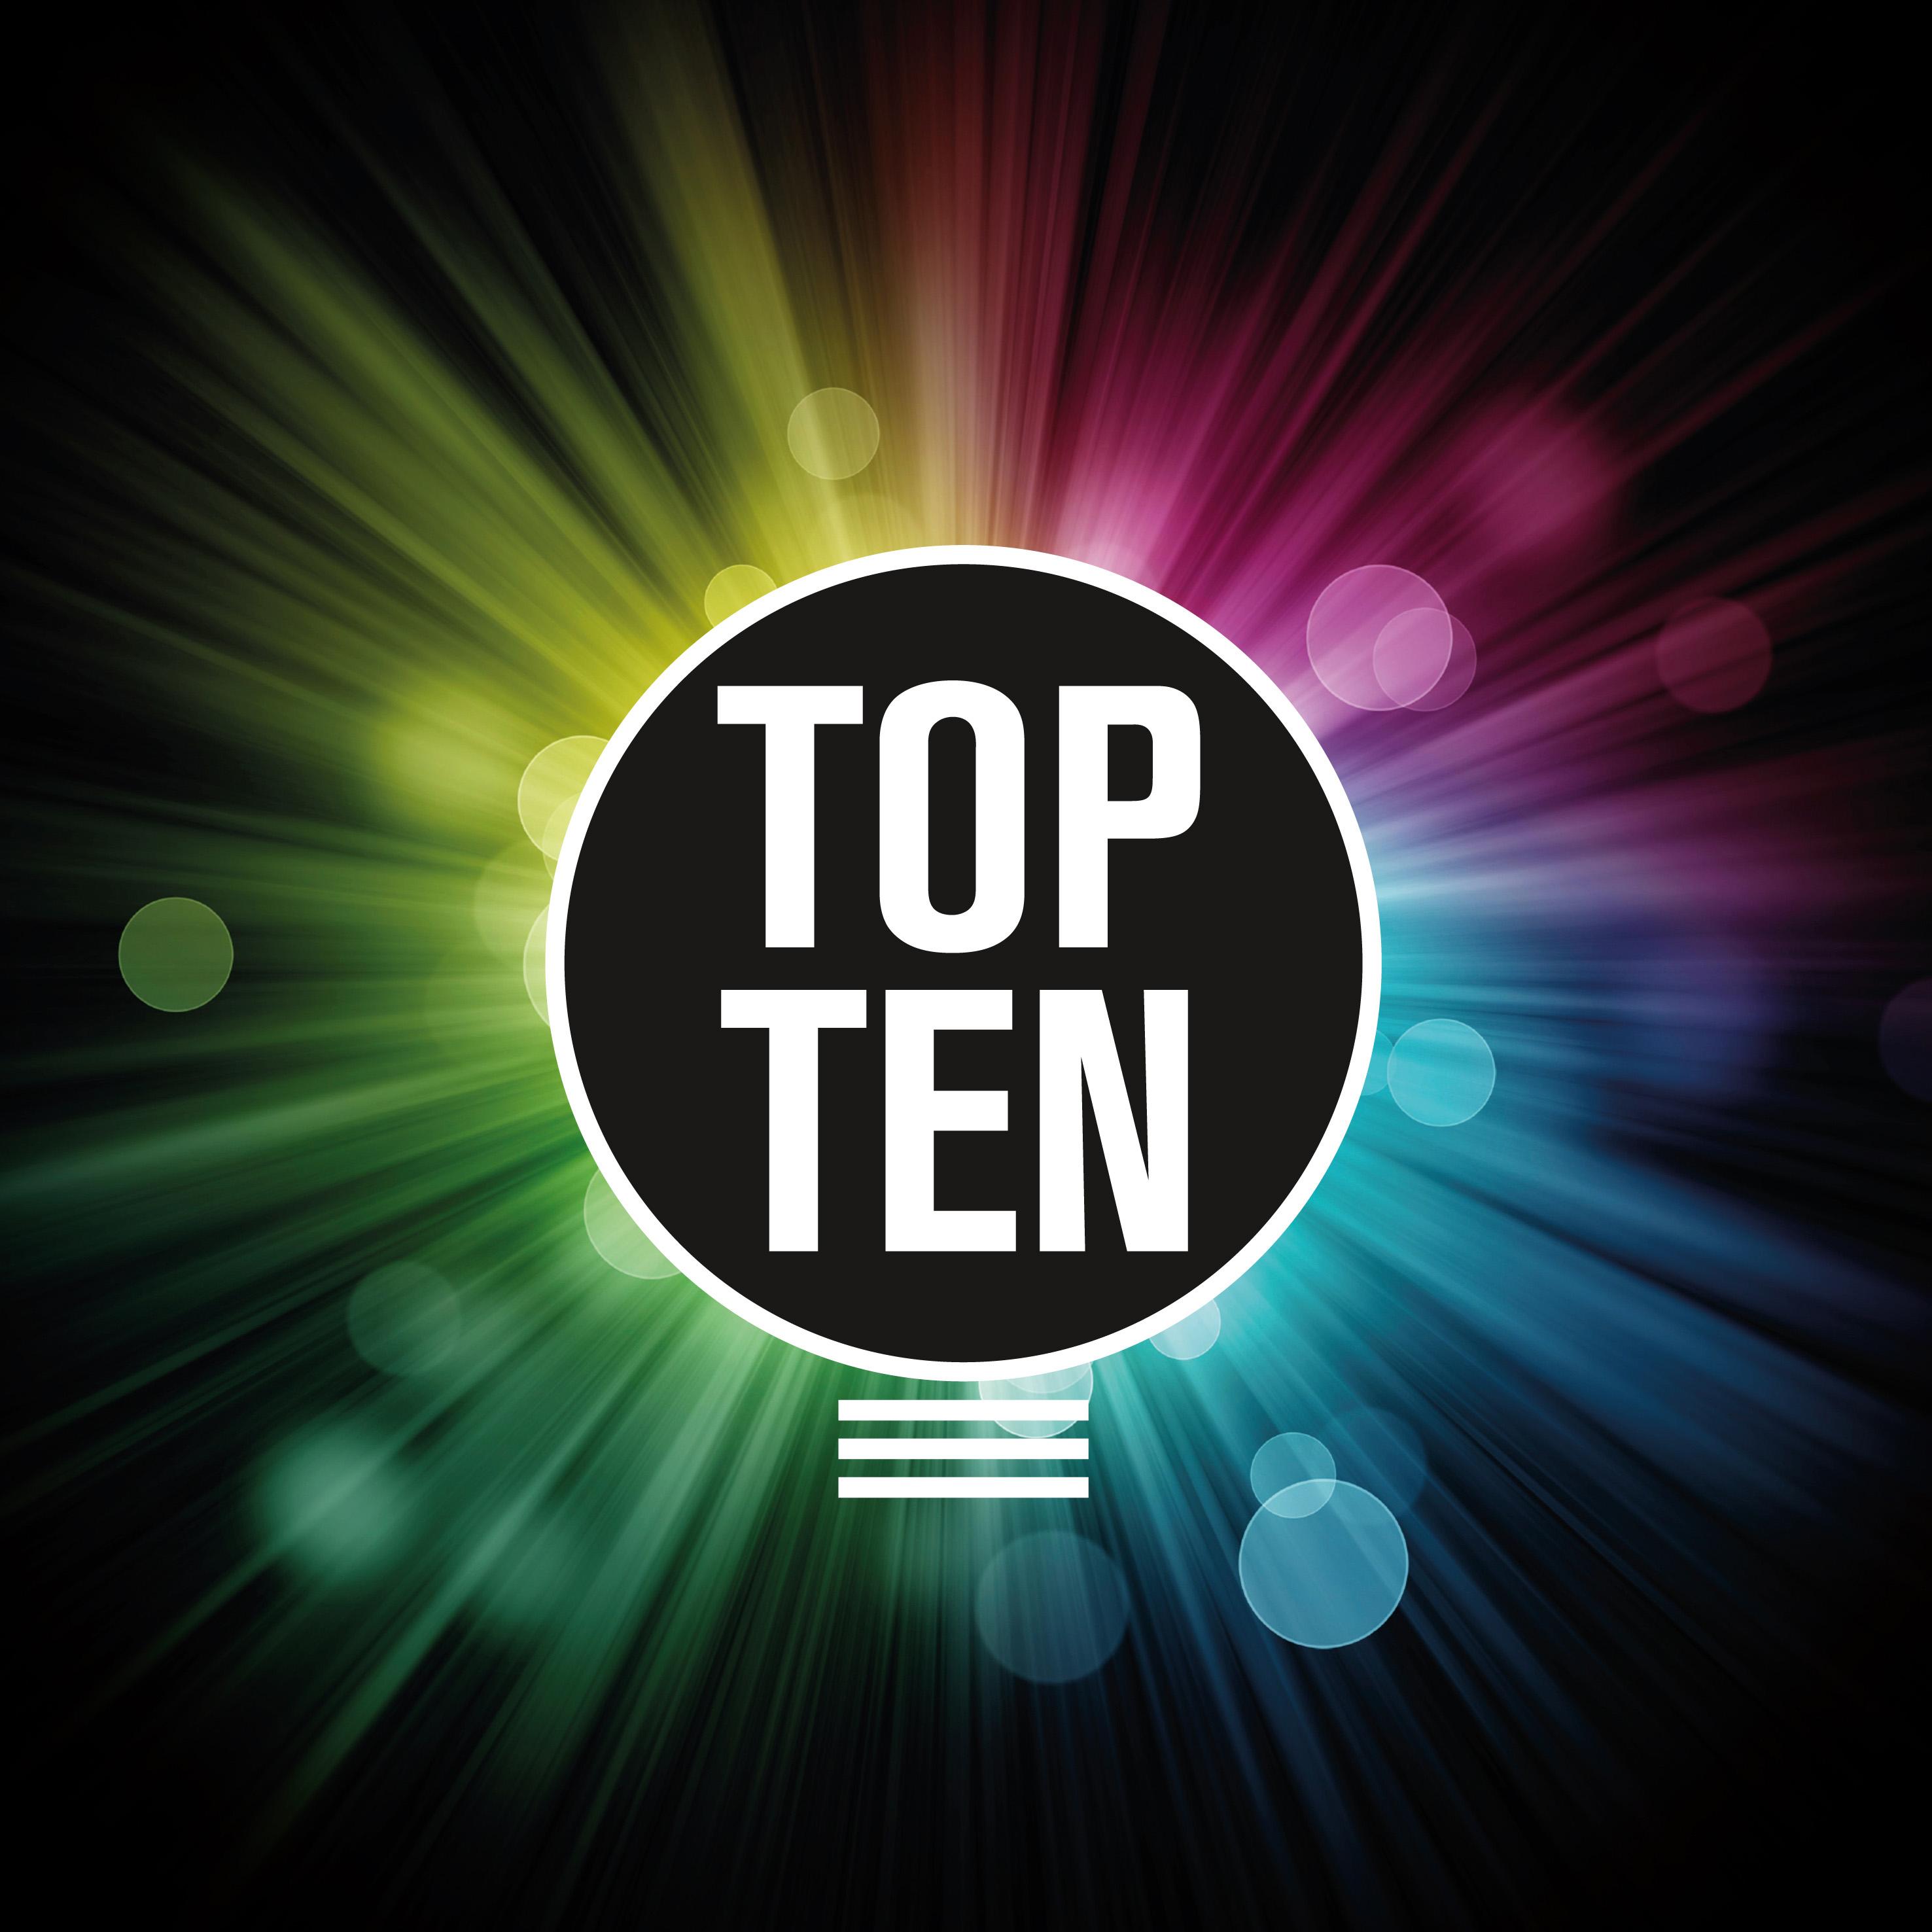 University Of Birmingham's 'top Ten' Celebrates Global Impact